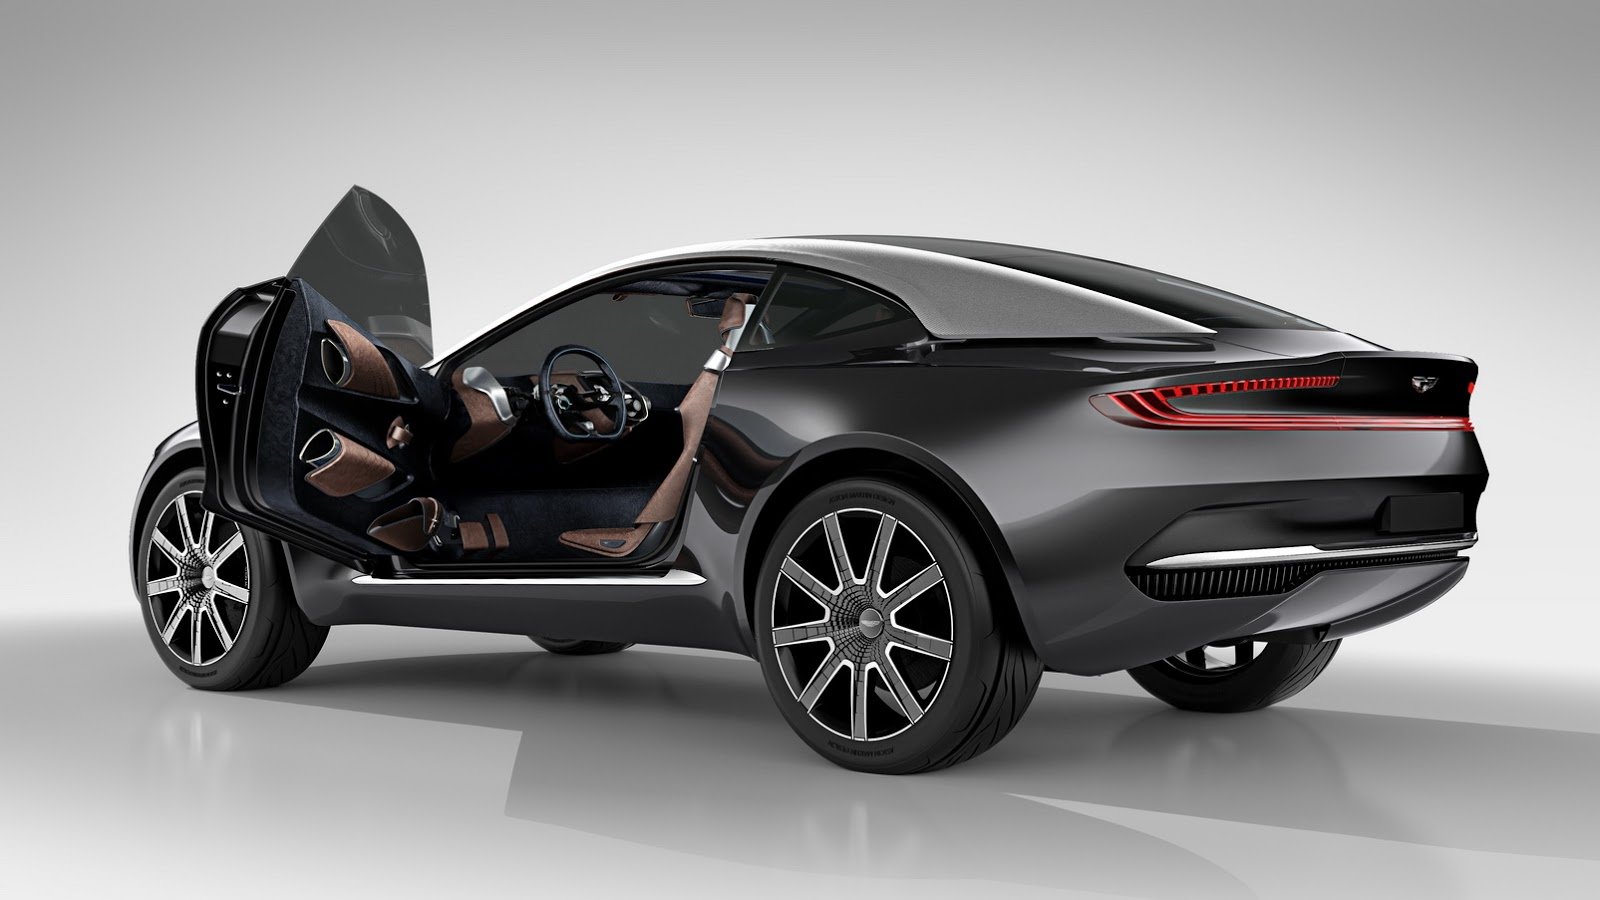 Aston Martin DBX SUV launch date